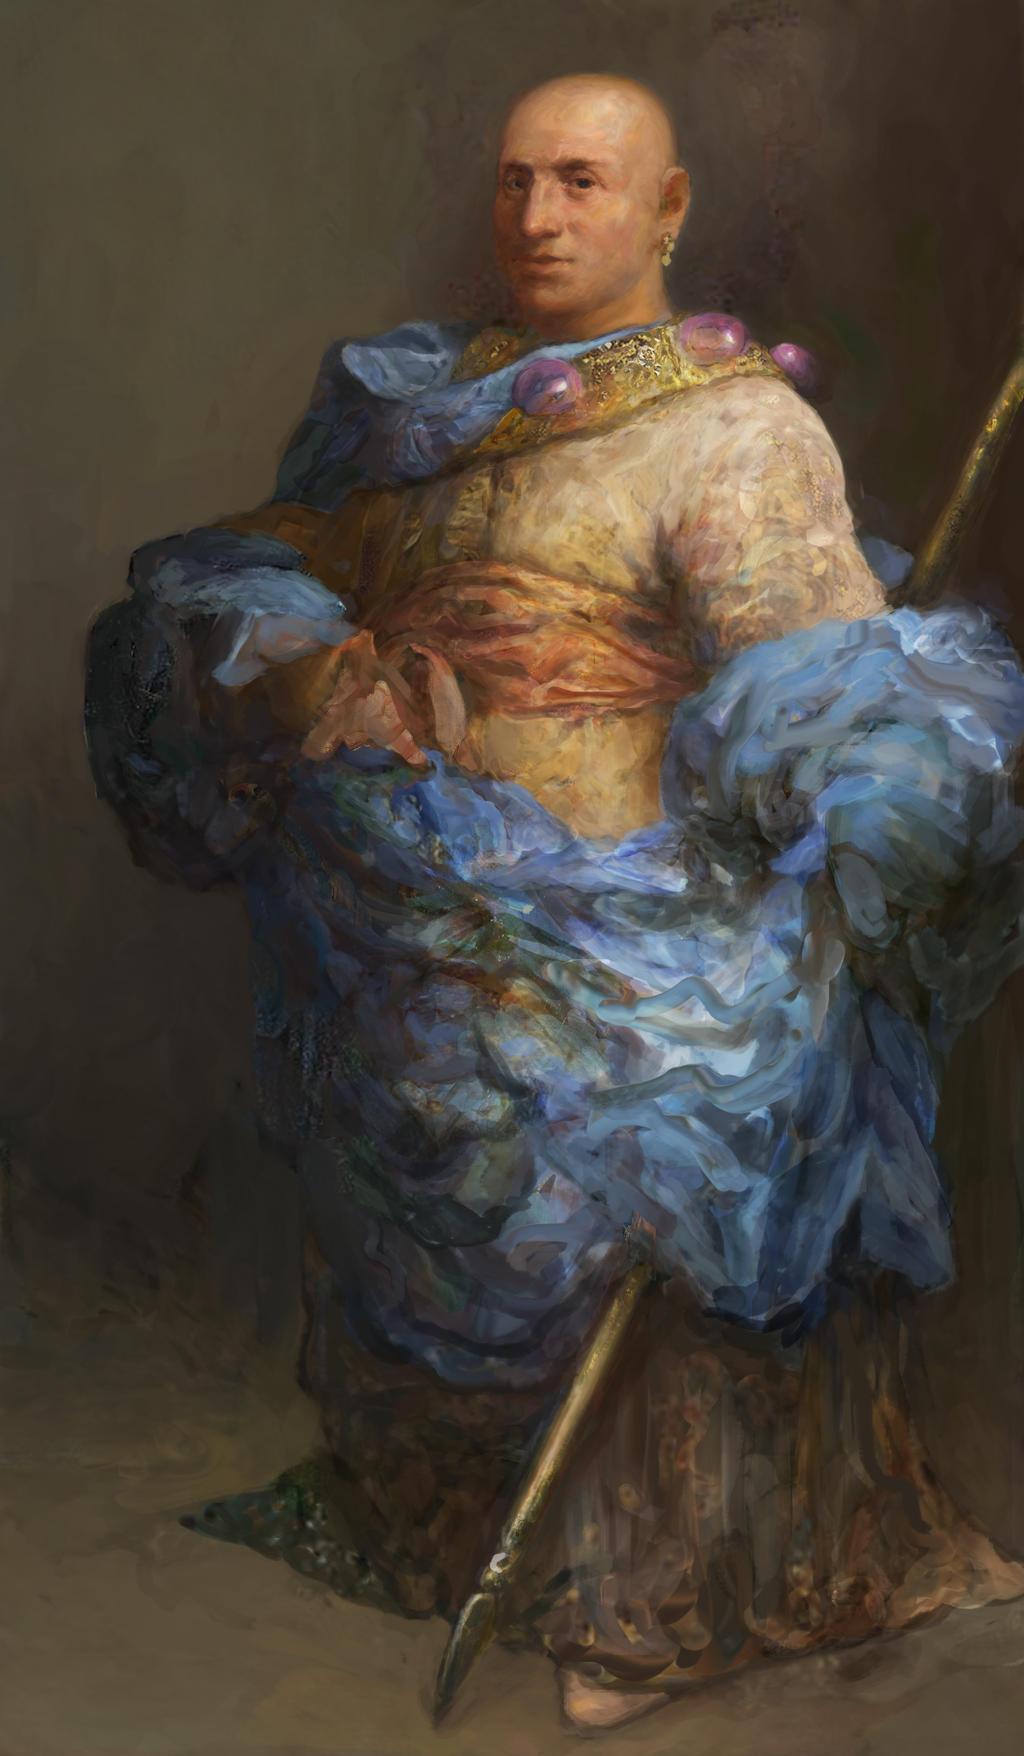 Morrowind: Trebonius Artorius 2 by IgorLevchenko